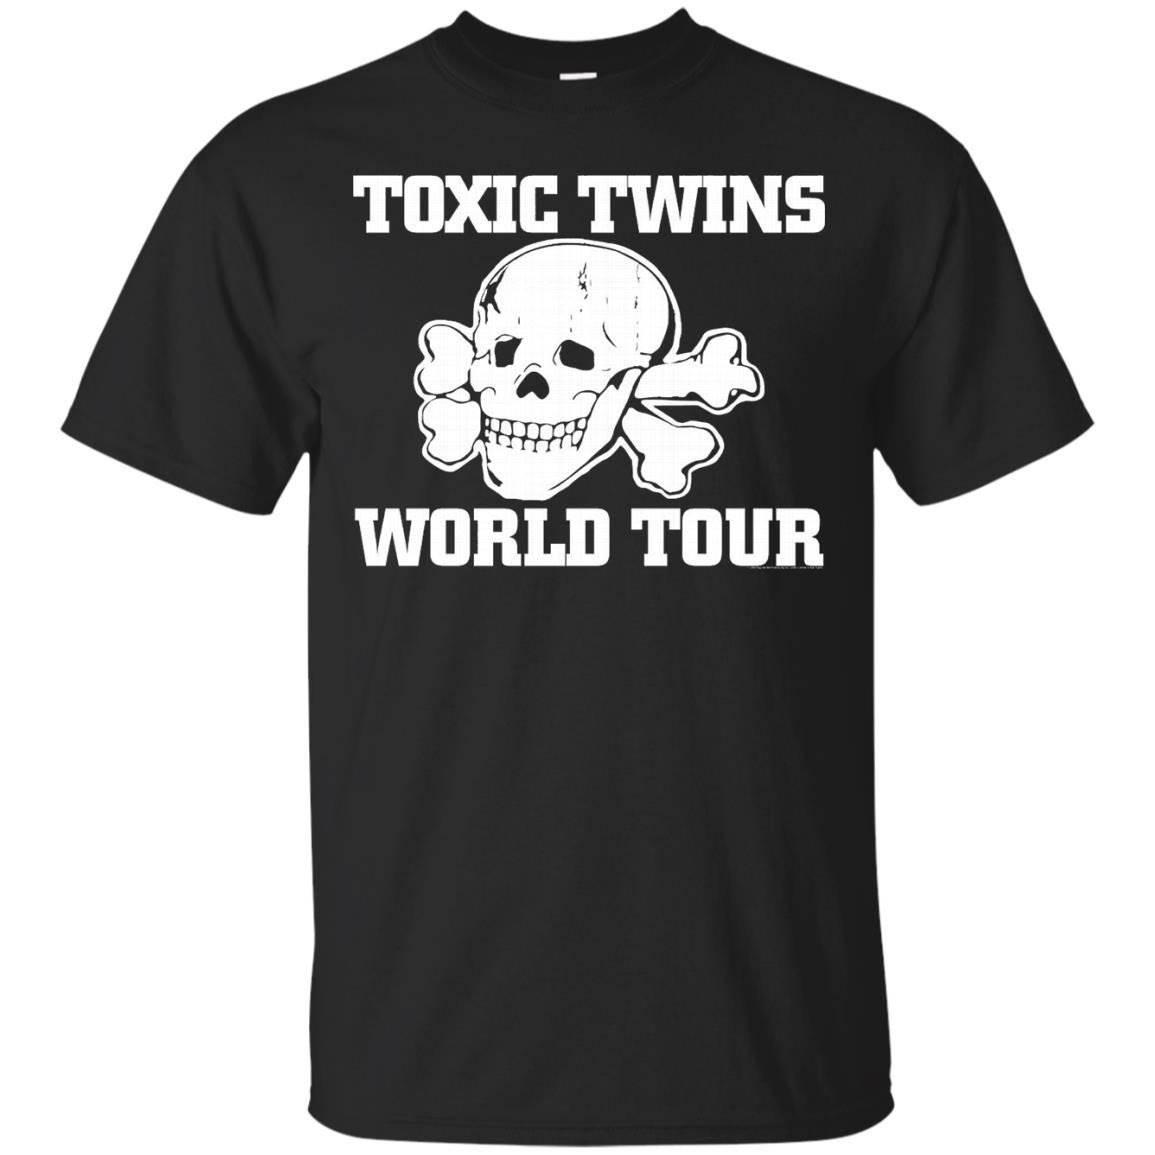 Aerosmith – Toxic Twins T-Shirt